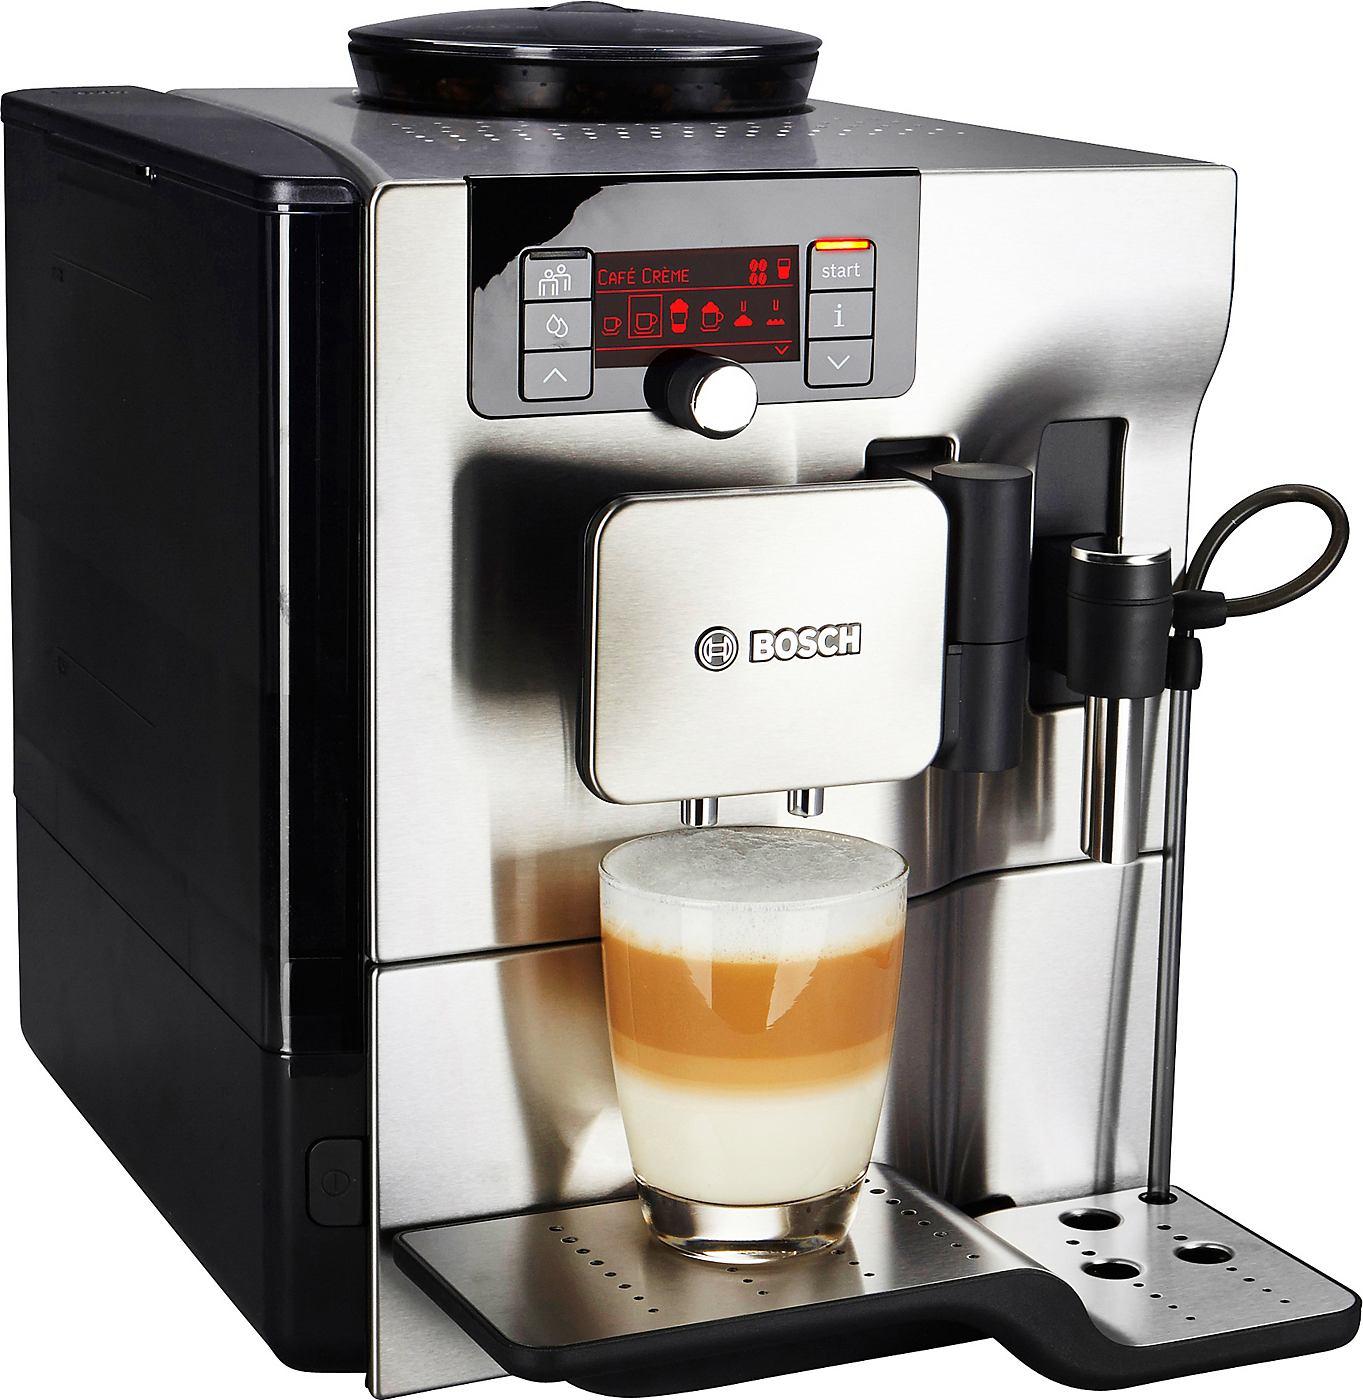 bosch kaffeevollautomat veroselection 300 tes80359de. Black Bedroom Furniture Sets. Home Design Ideas